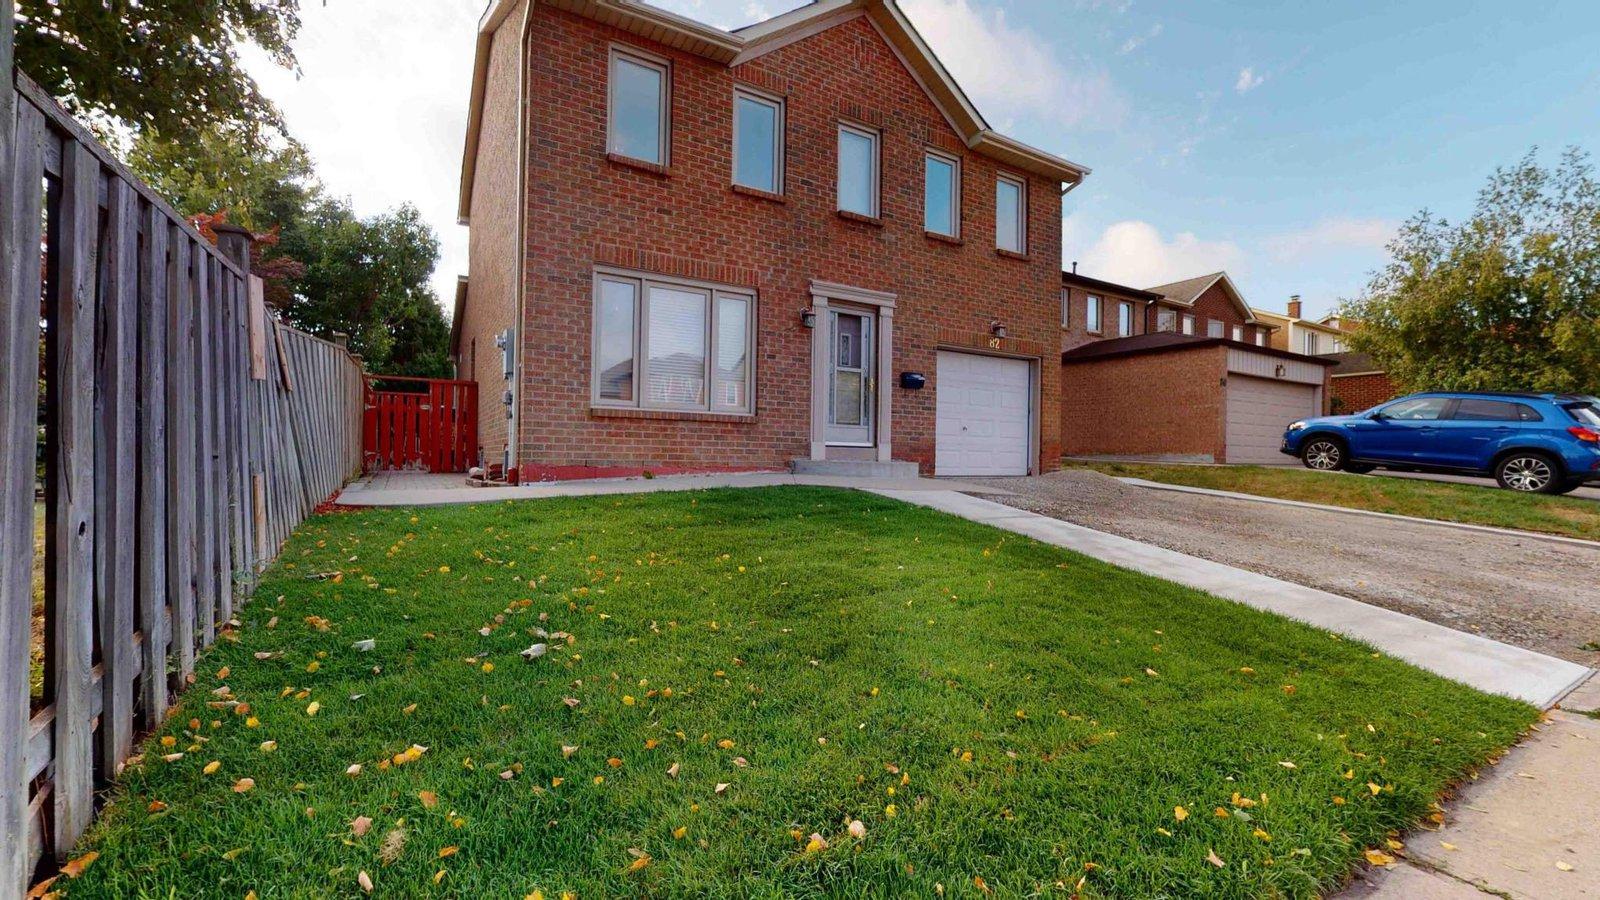 Craigslist section 8 homes for rent